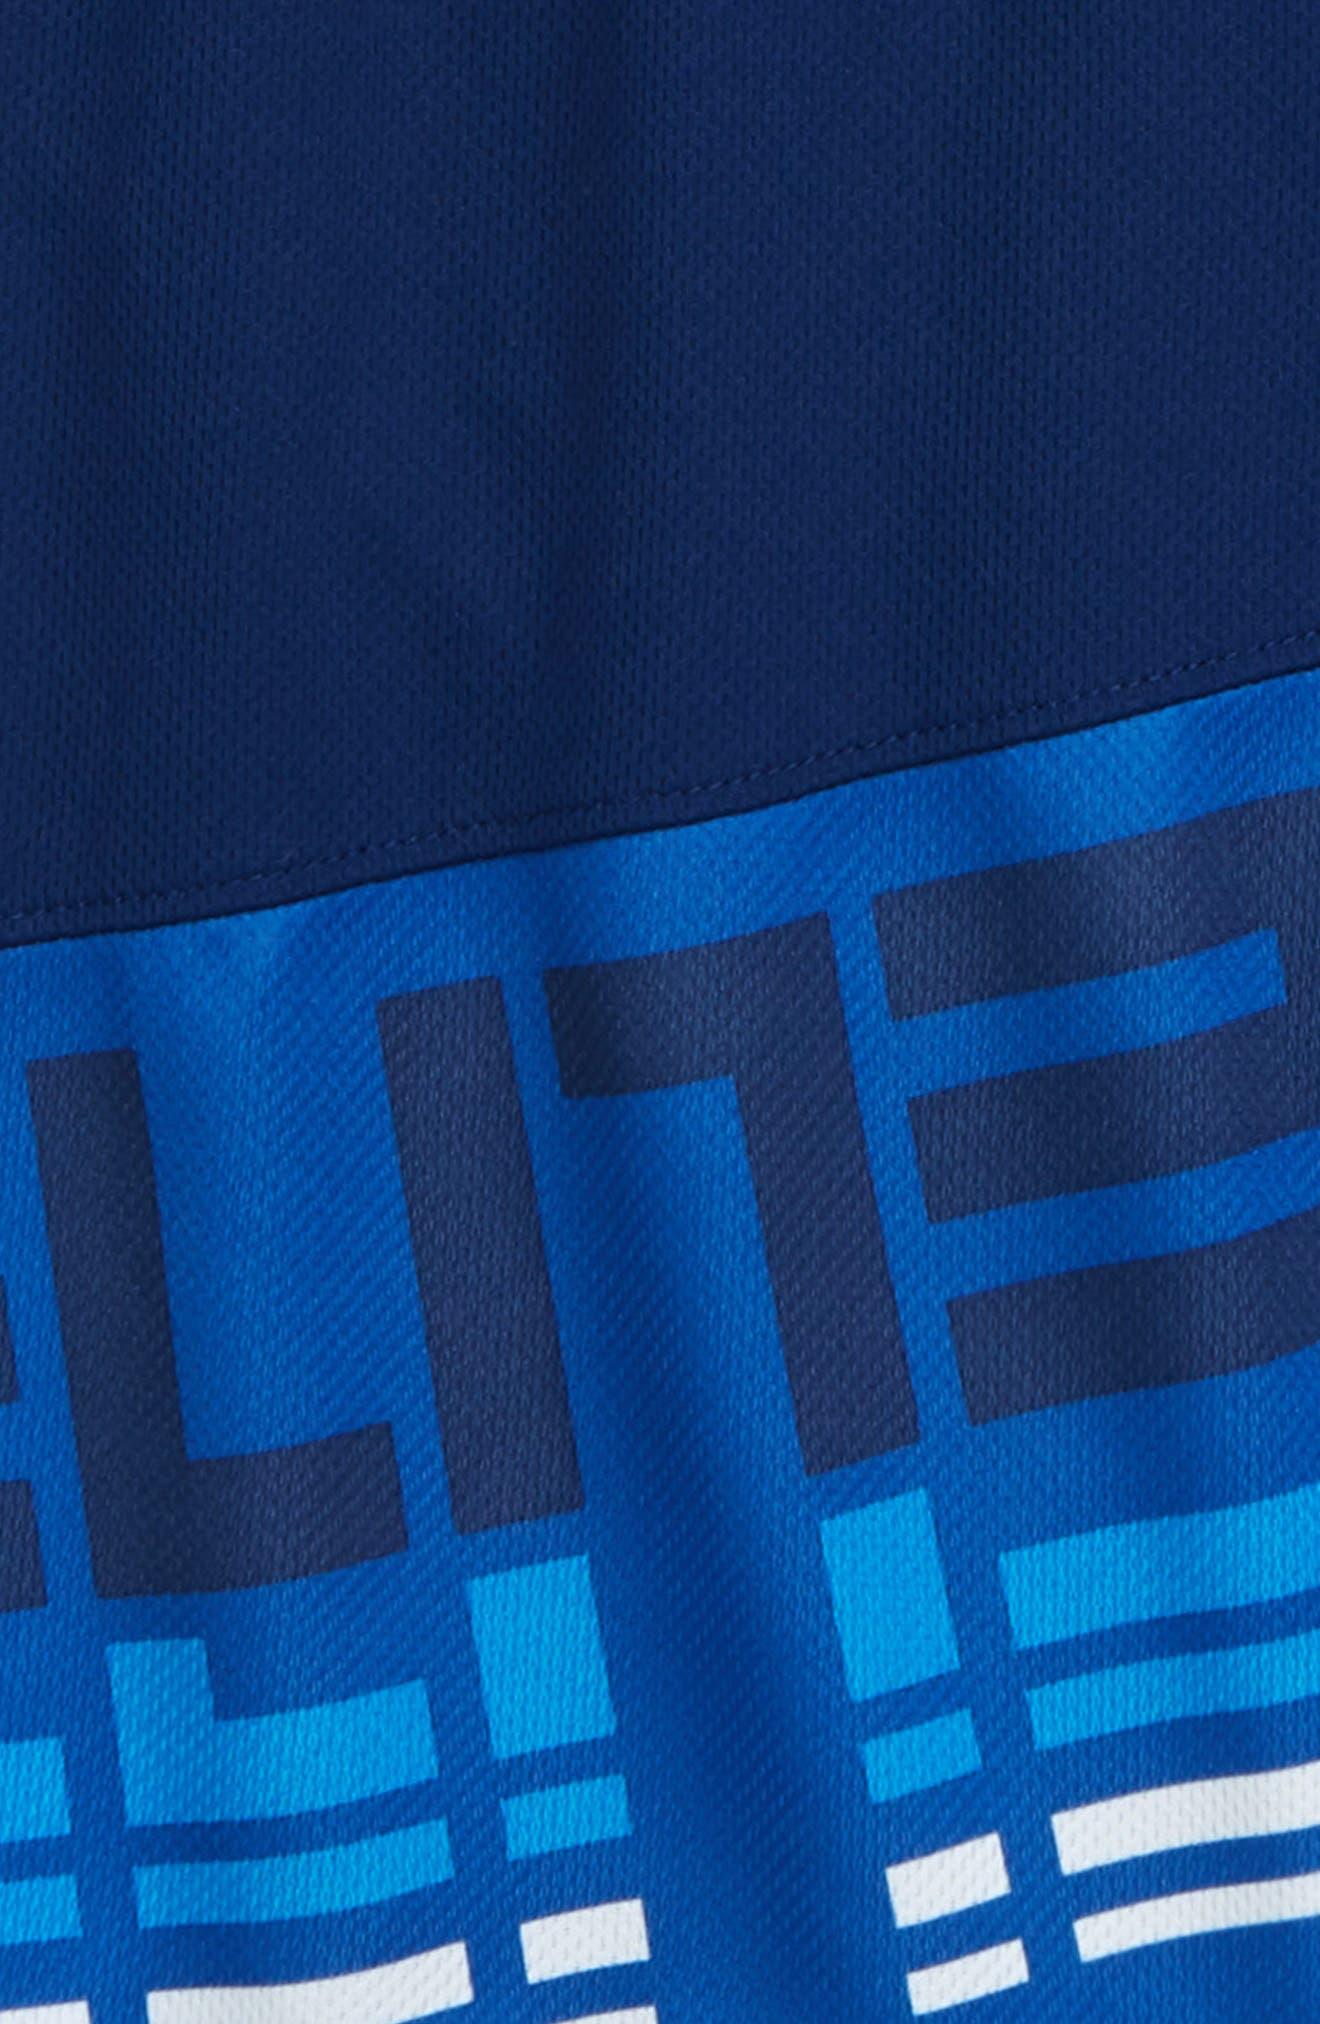 Dry Elite Athletic Shorts,                             Alternate thumbnail 3, color,                             BLUE VOID/ WHITE